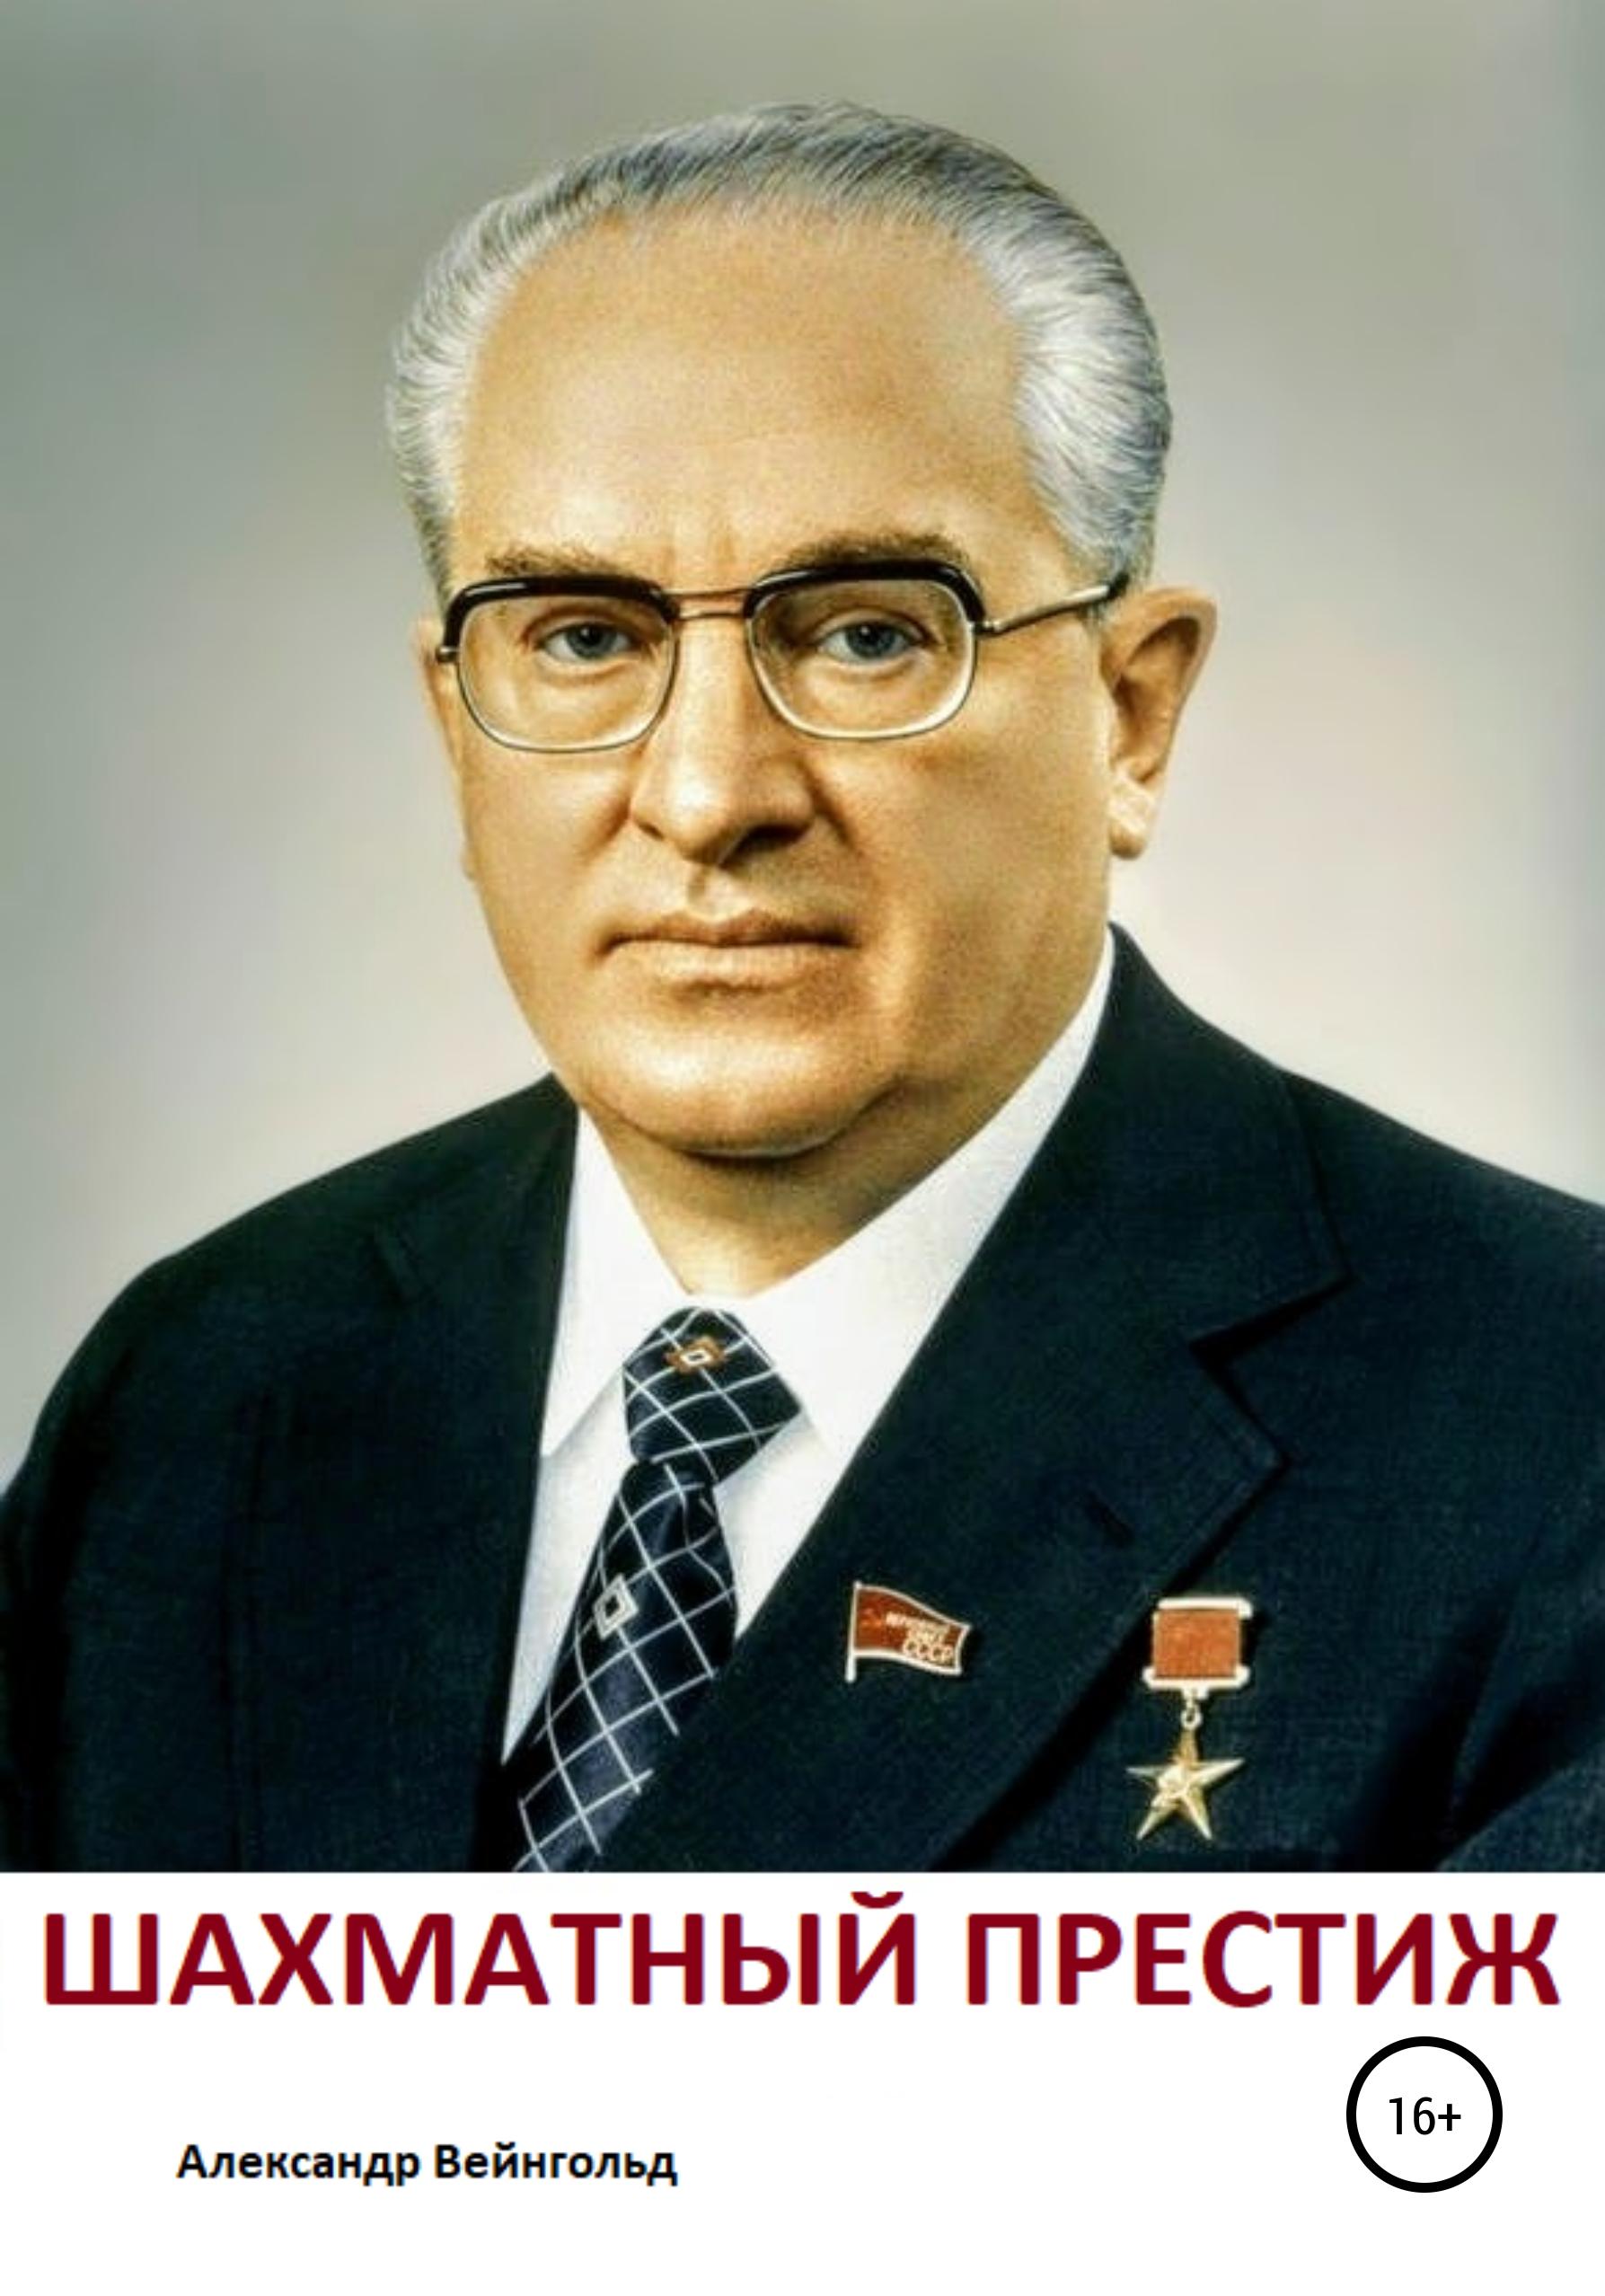 Александр Вейнгольд - Шахматный престиж